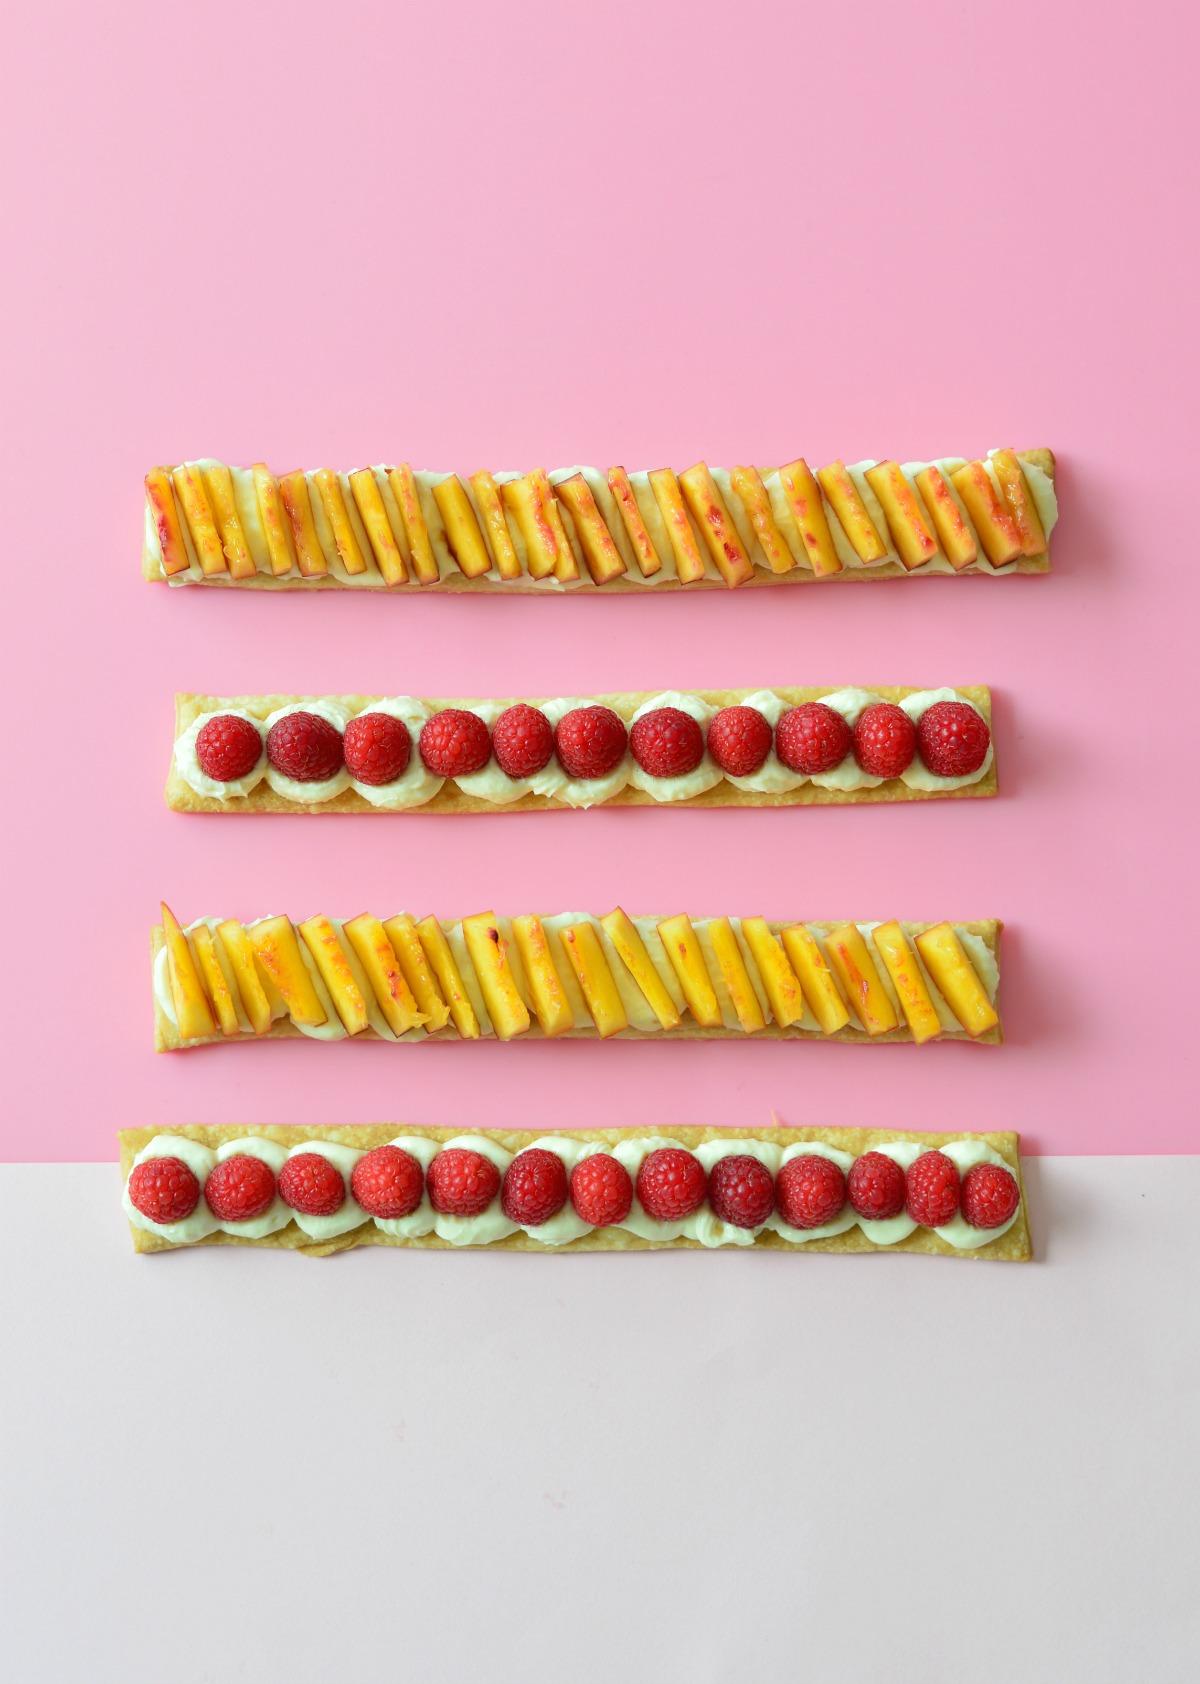 shortcrust pastry fruit slices